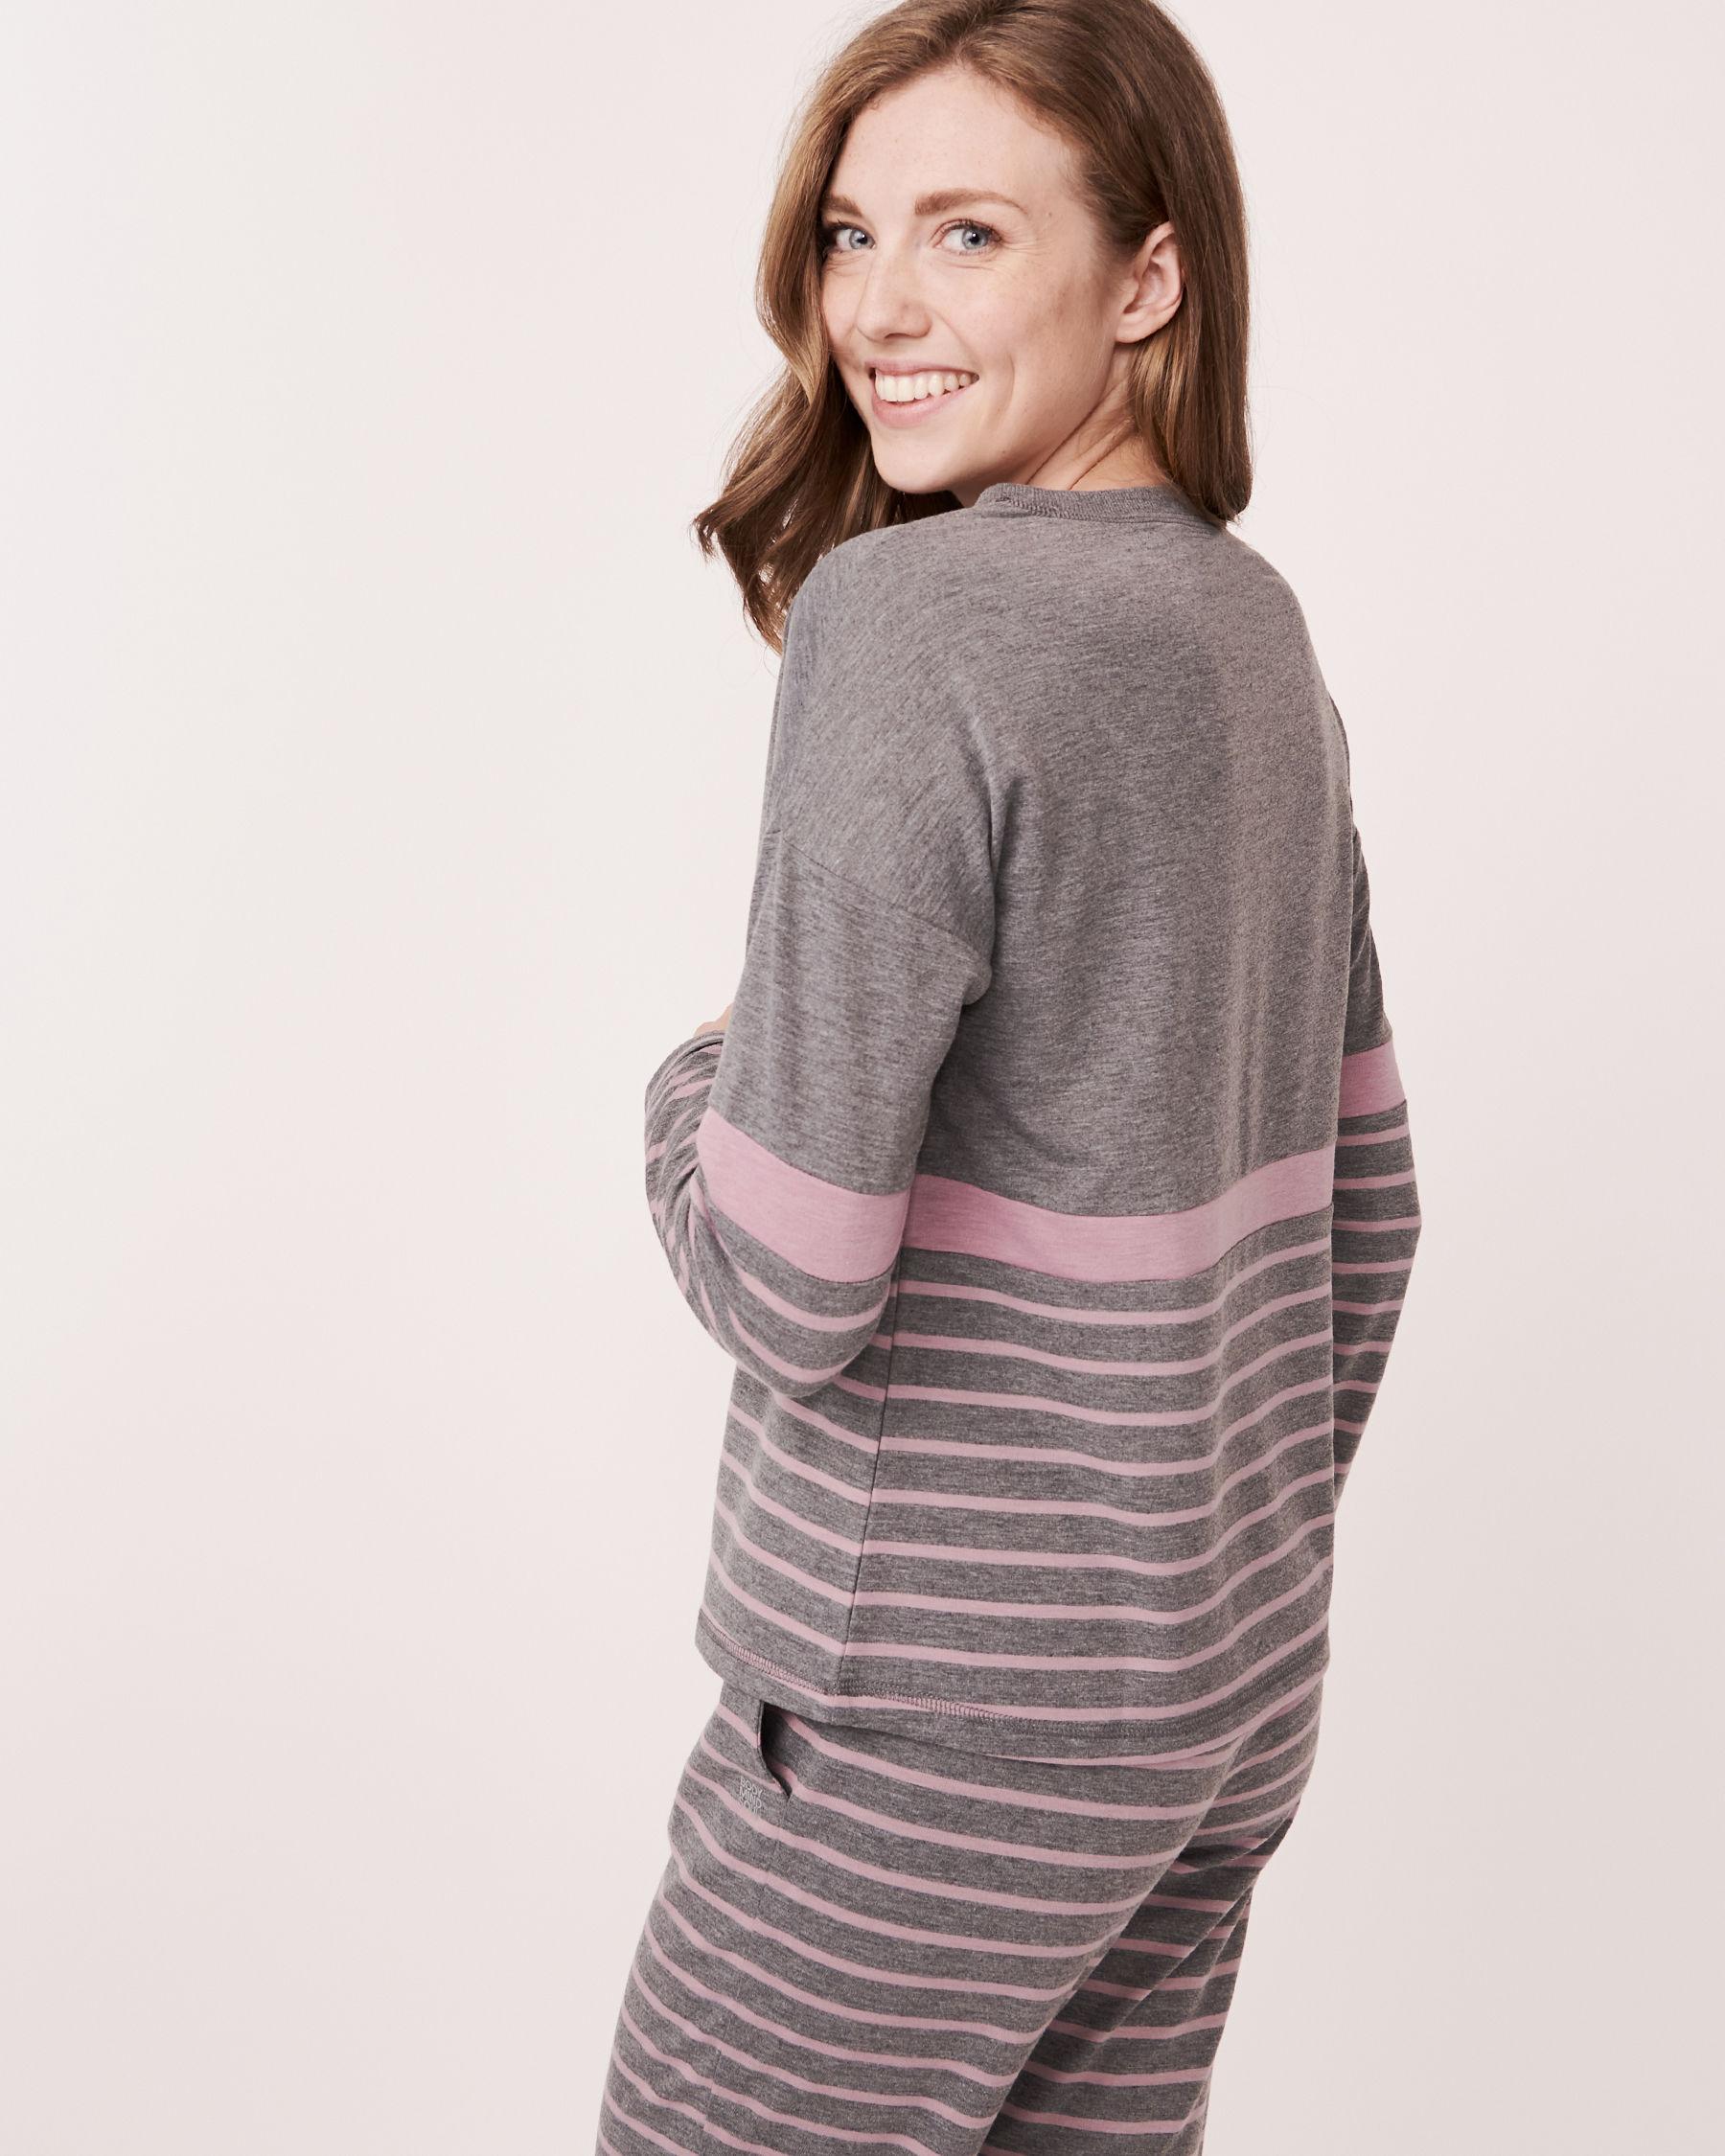 LA VIE EN ROSE Long Sleeve Striped Shirt Grey and pink mix 768-373-0-11 - View2